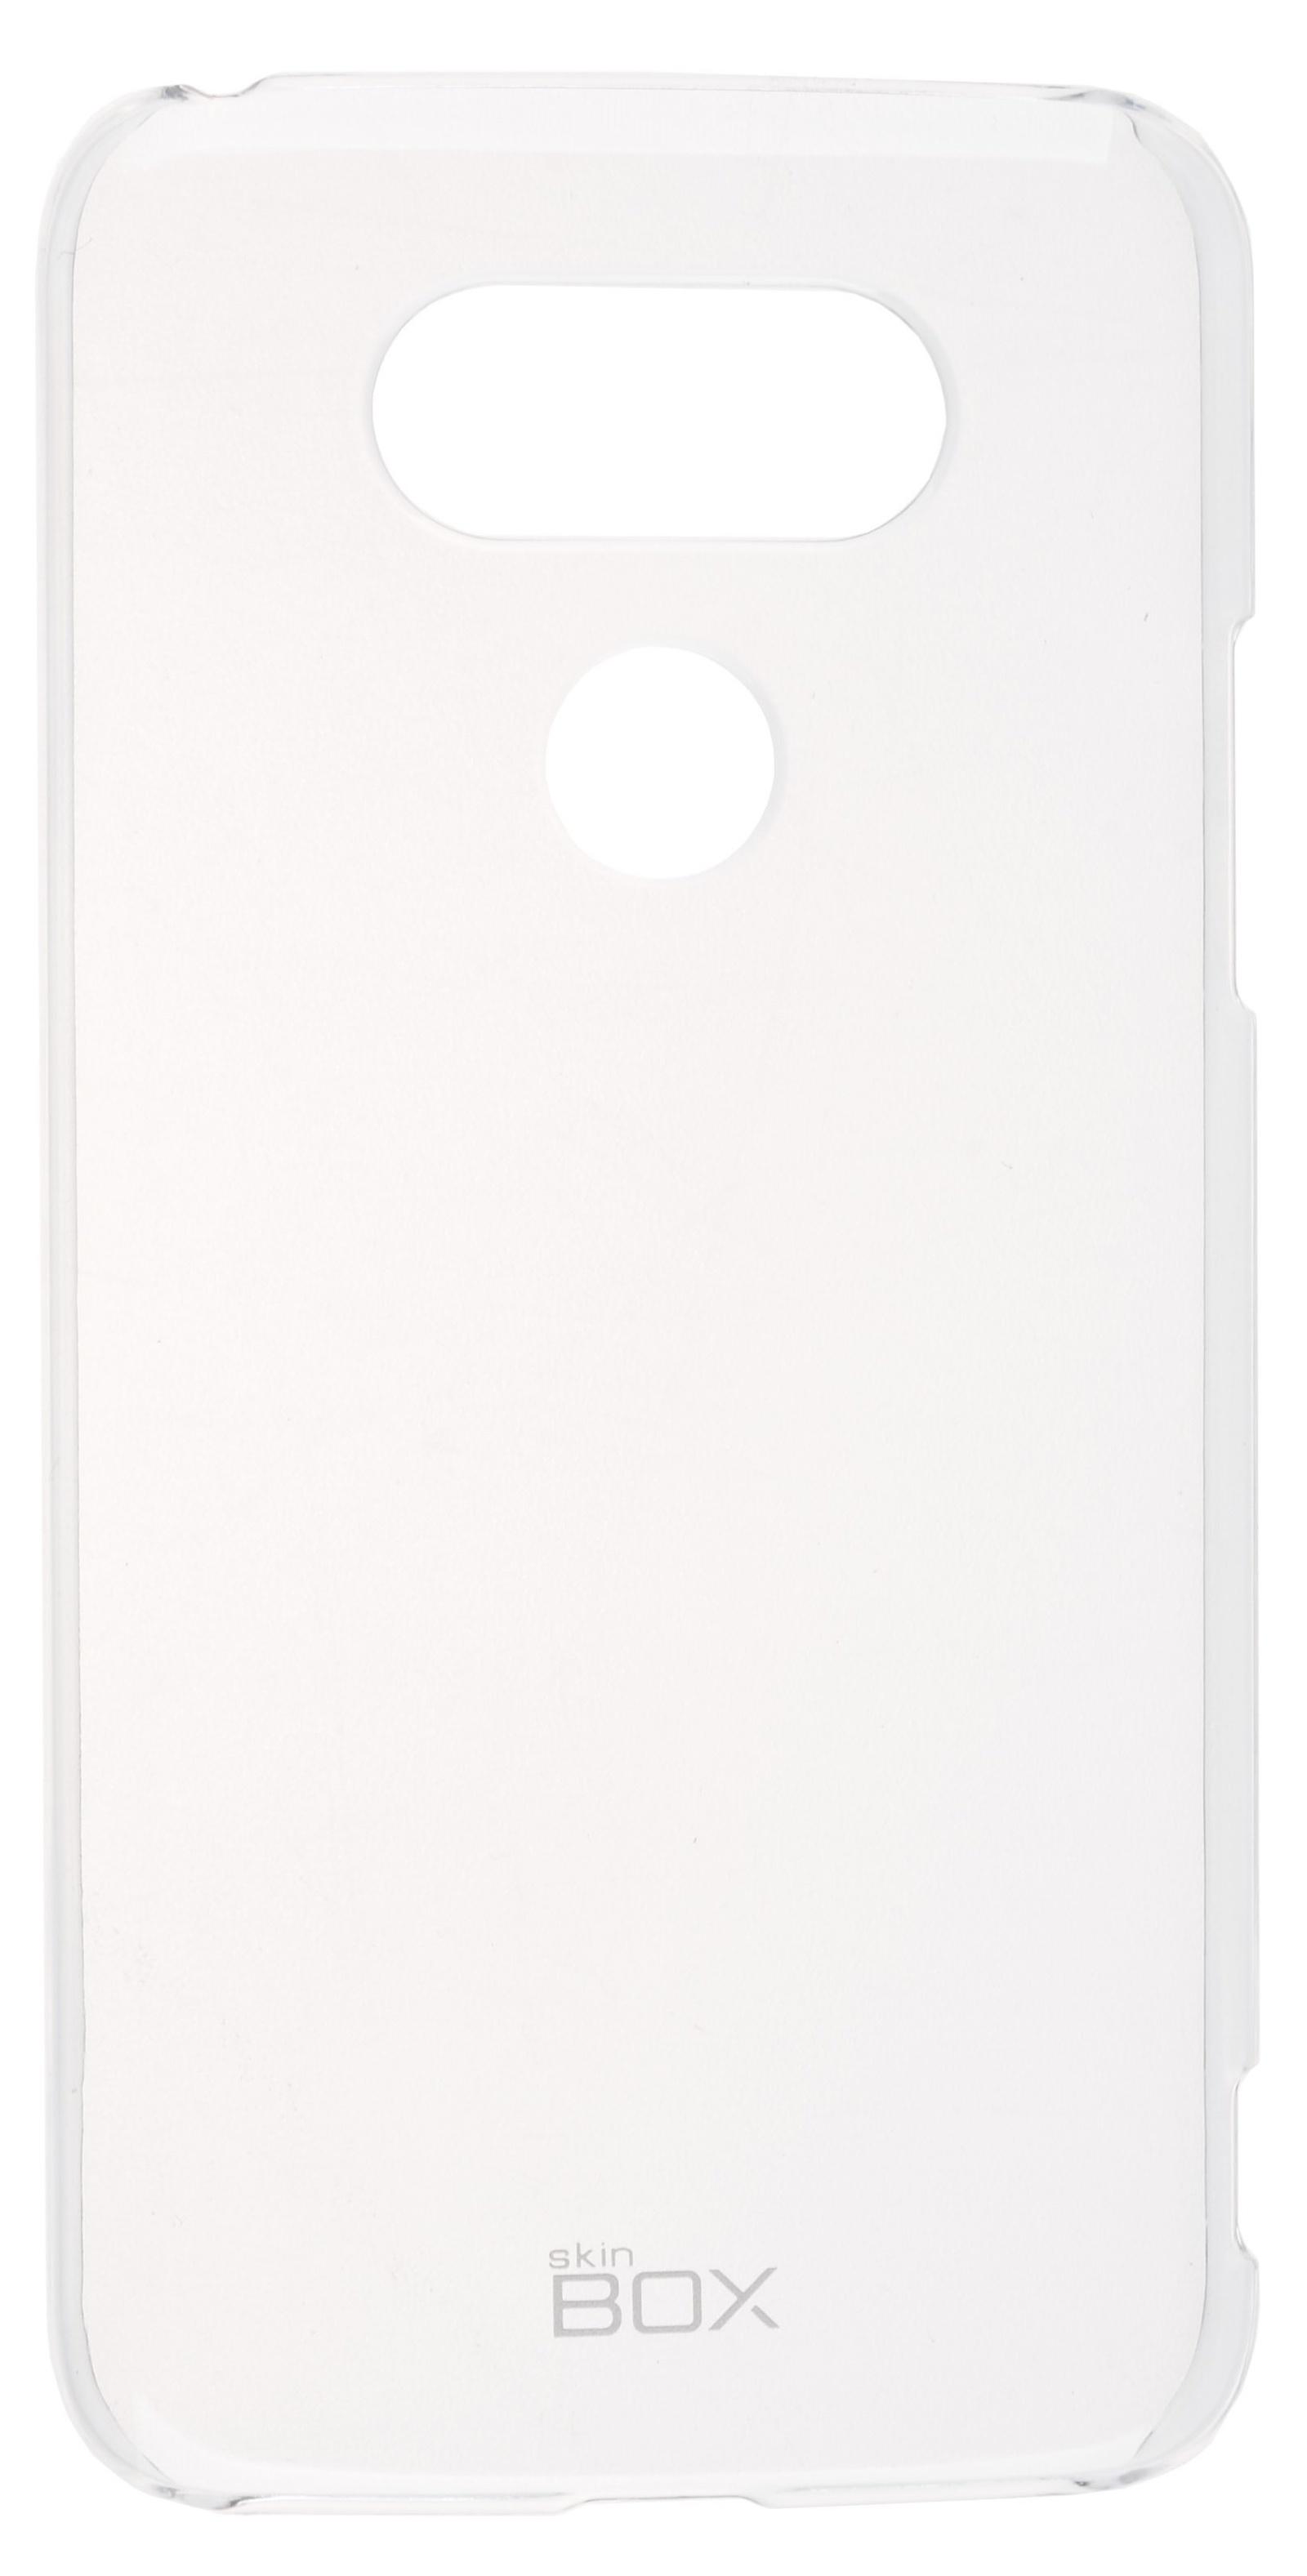 Чехол для сотового телефона skinBOX Crystal, 4660041407549, прозрачный цена